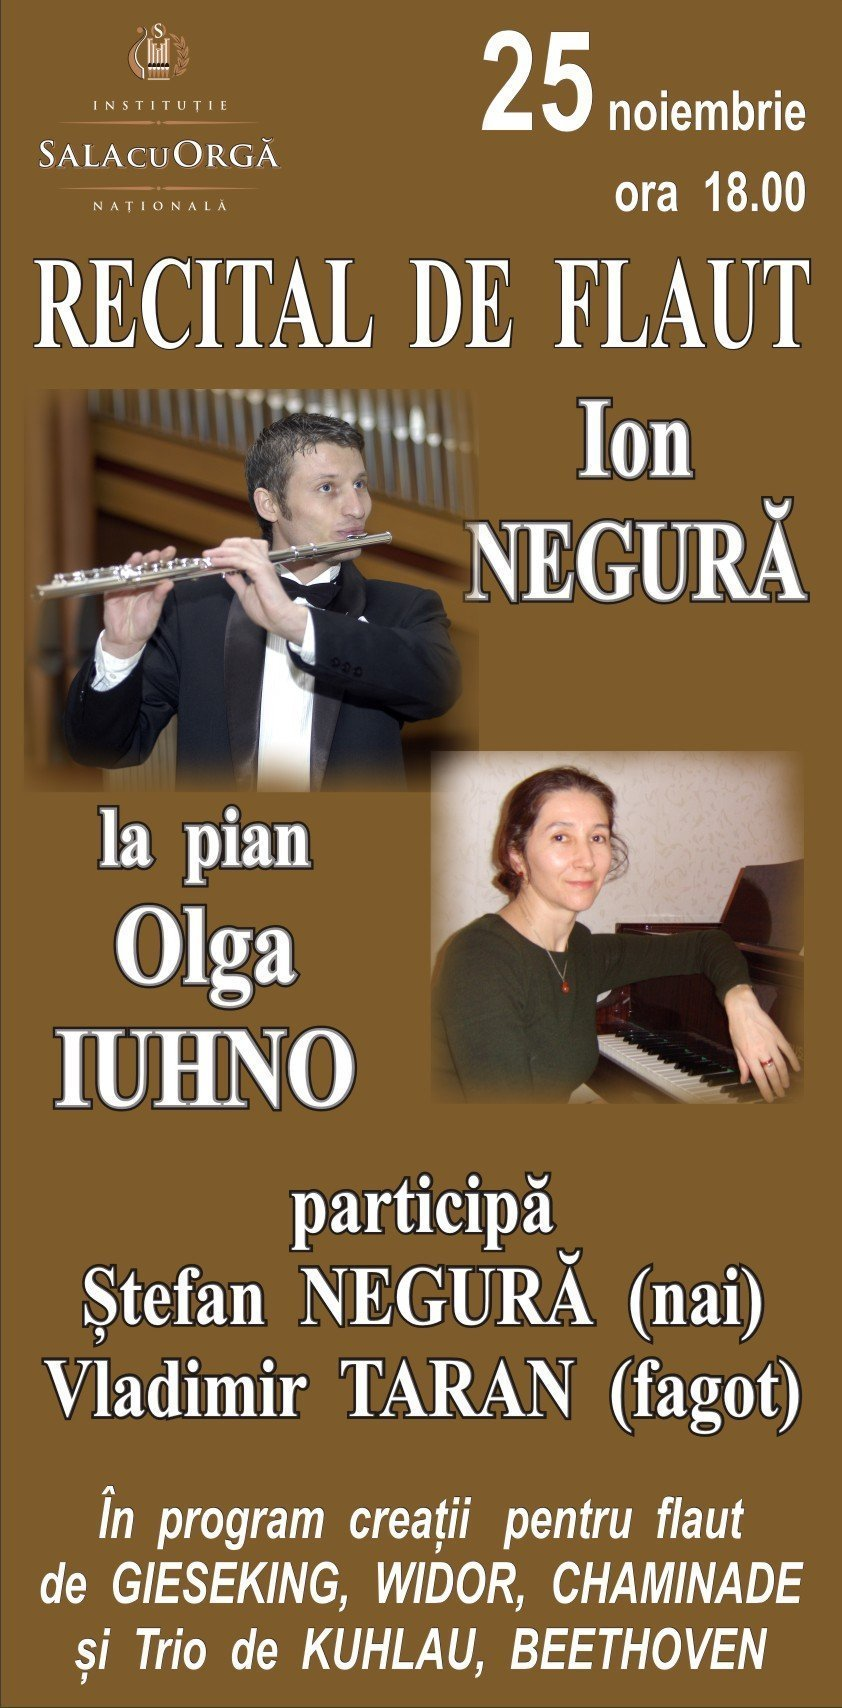 Recital de flaut